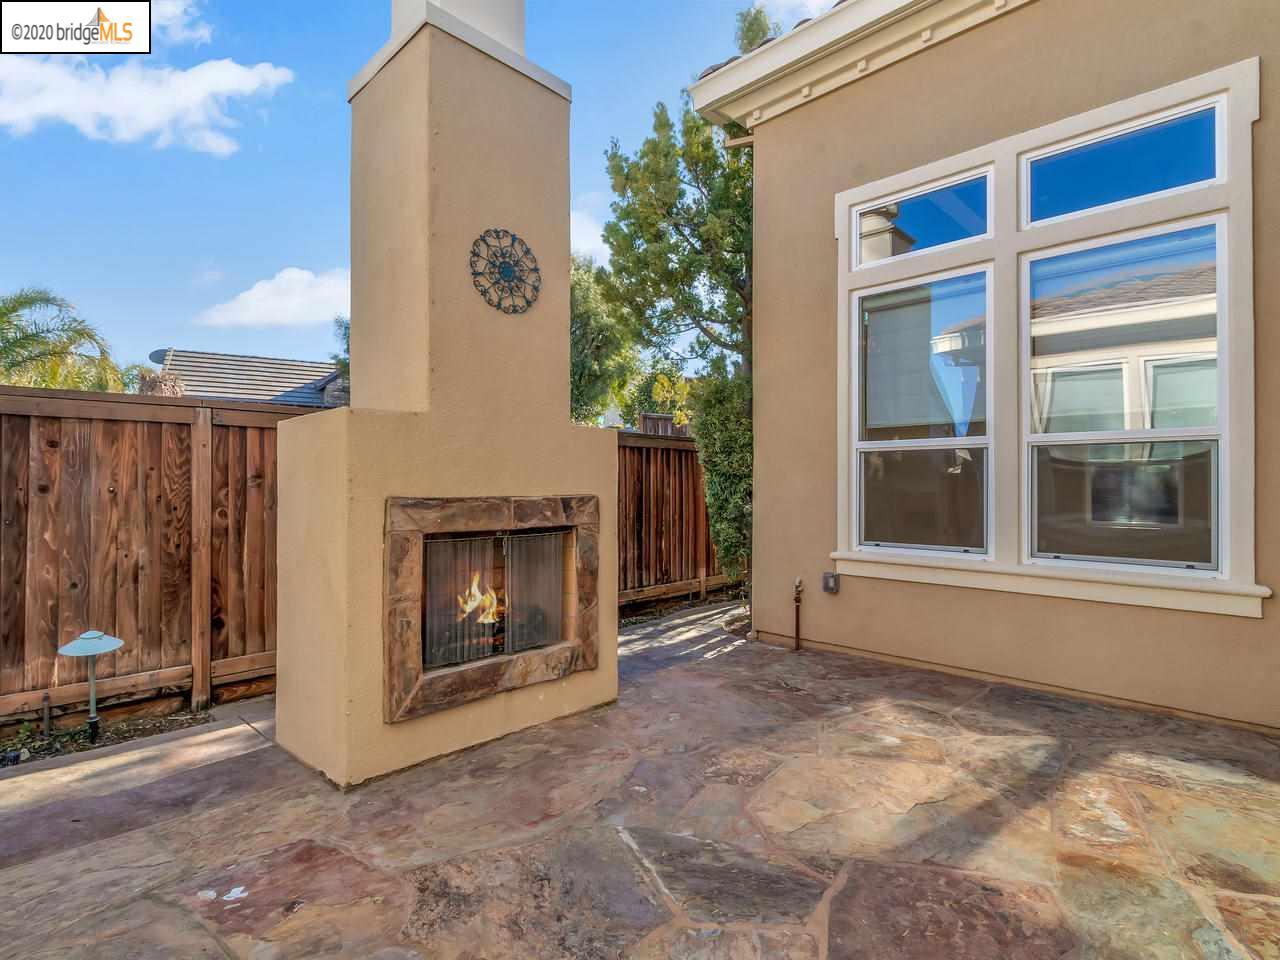 1103 Lafite Ct, Brentwood, CA 94513